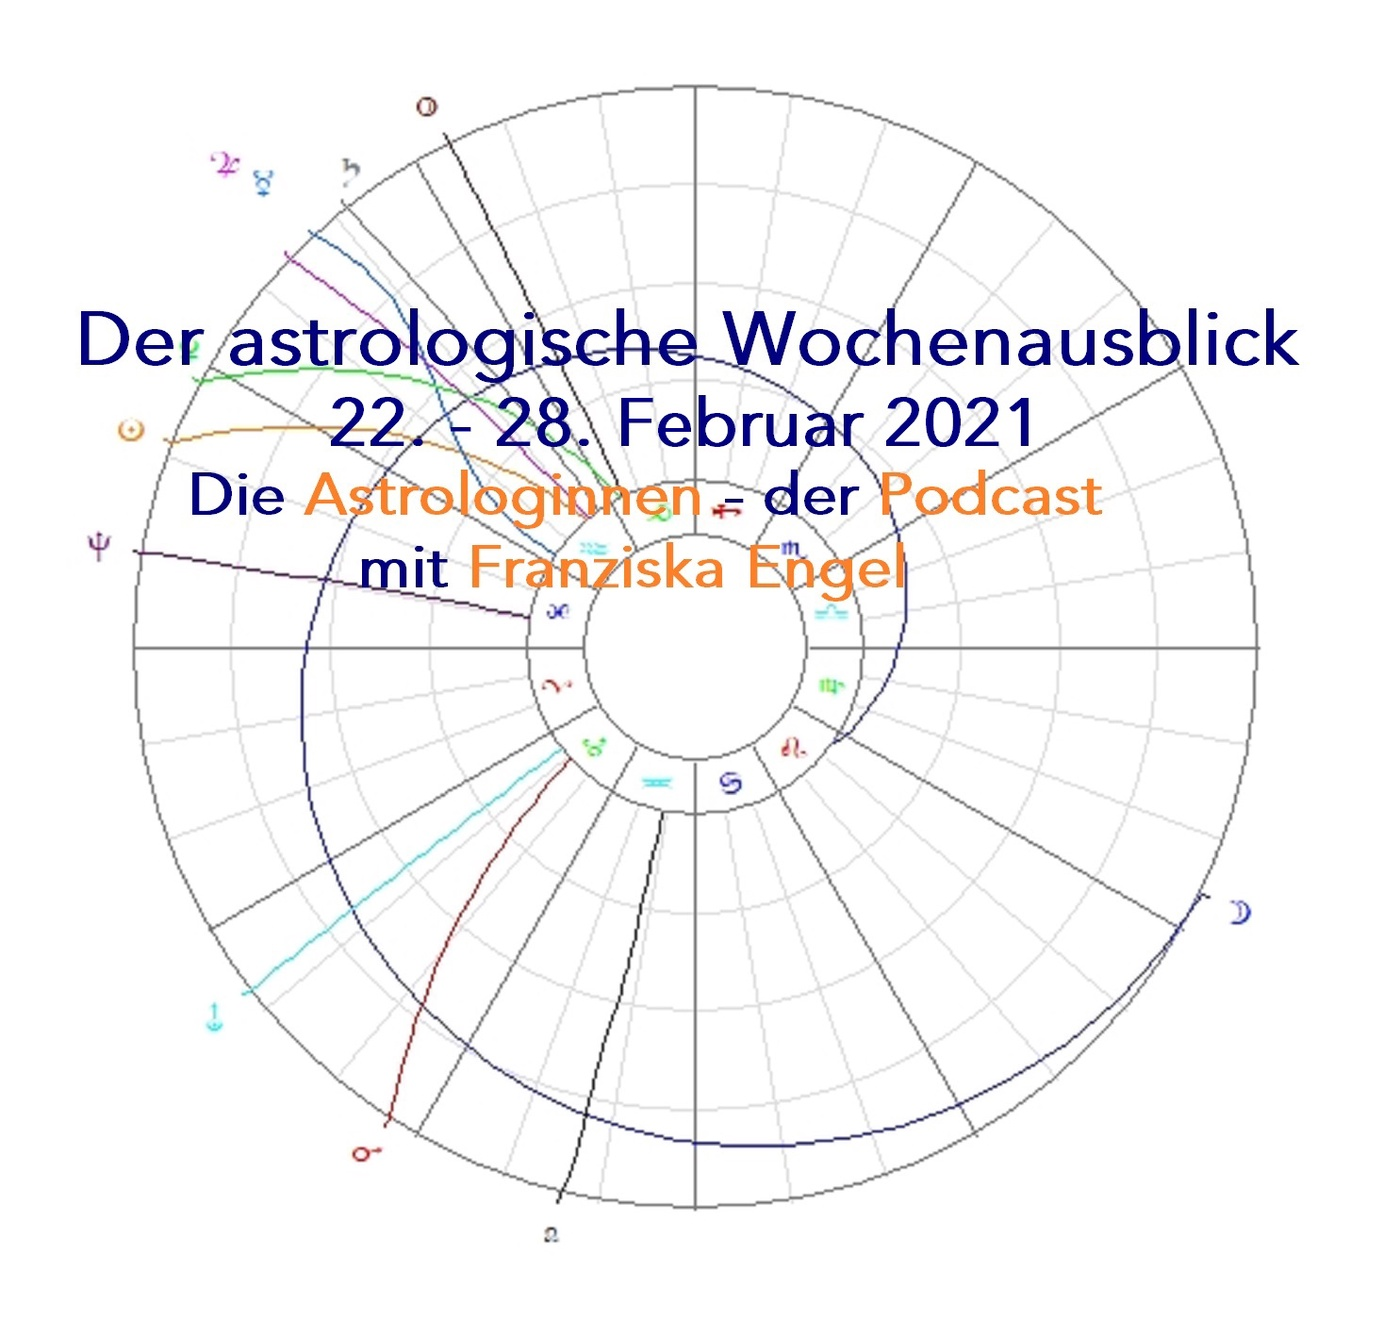 Astrologischer Wochenausblick 22. - 28. Februar 2021